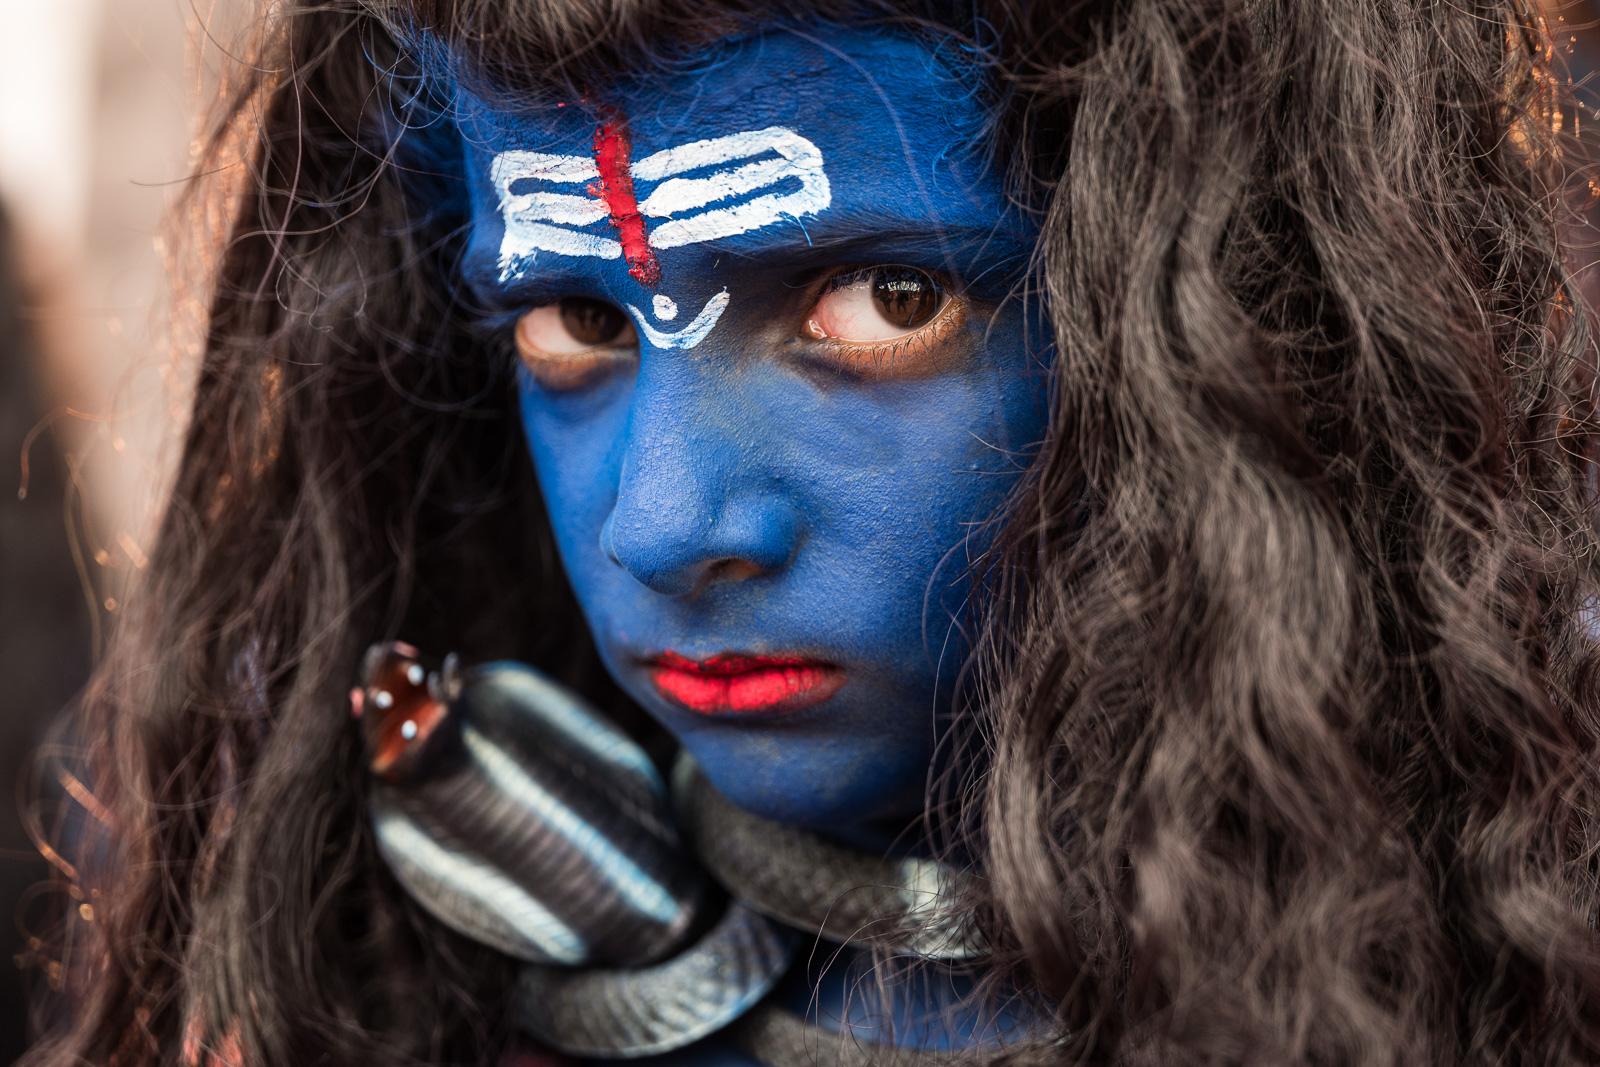 The-Great-Indian-Portrait-Contest-GMax-Studios.jpg